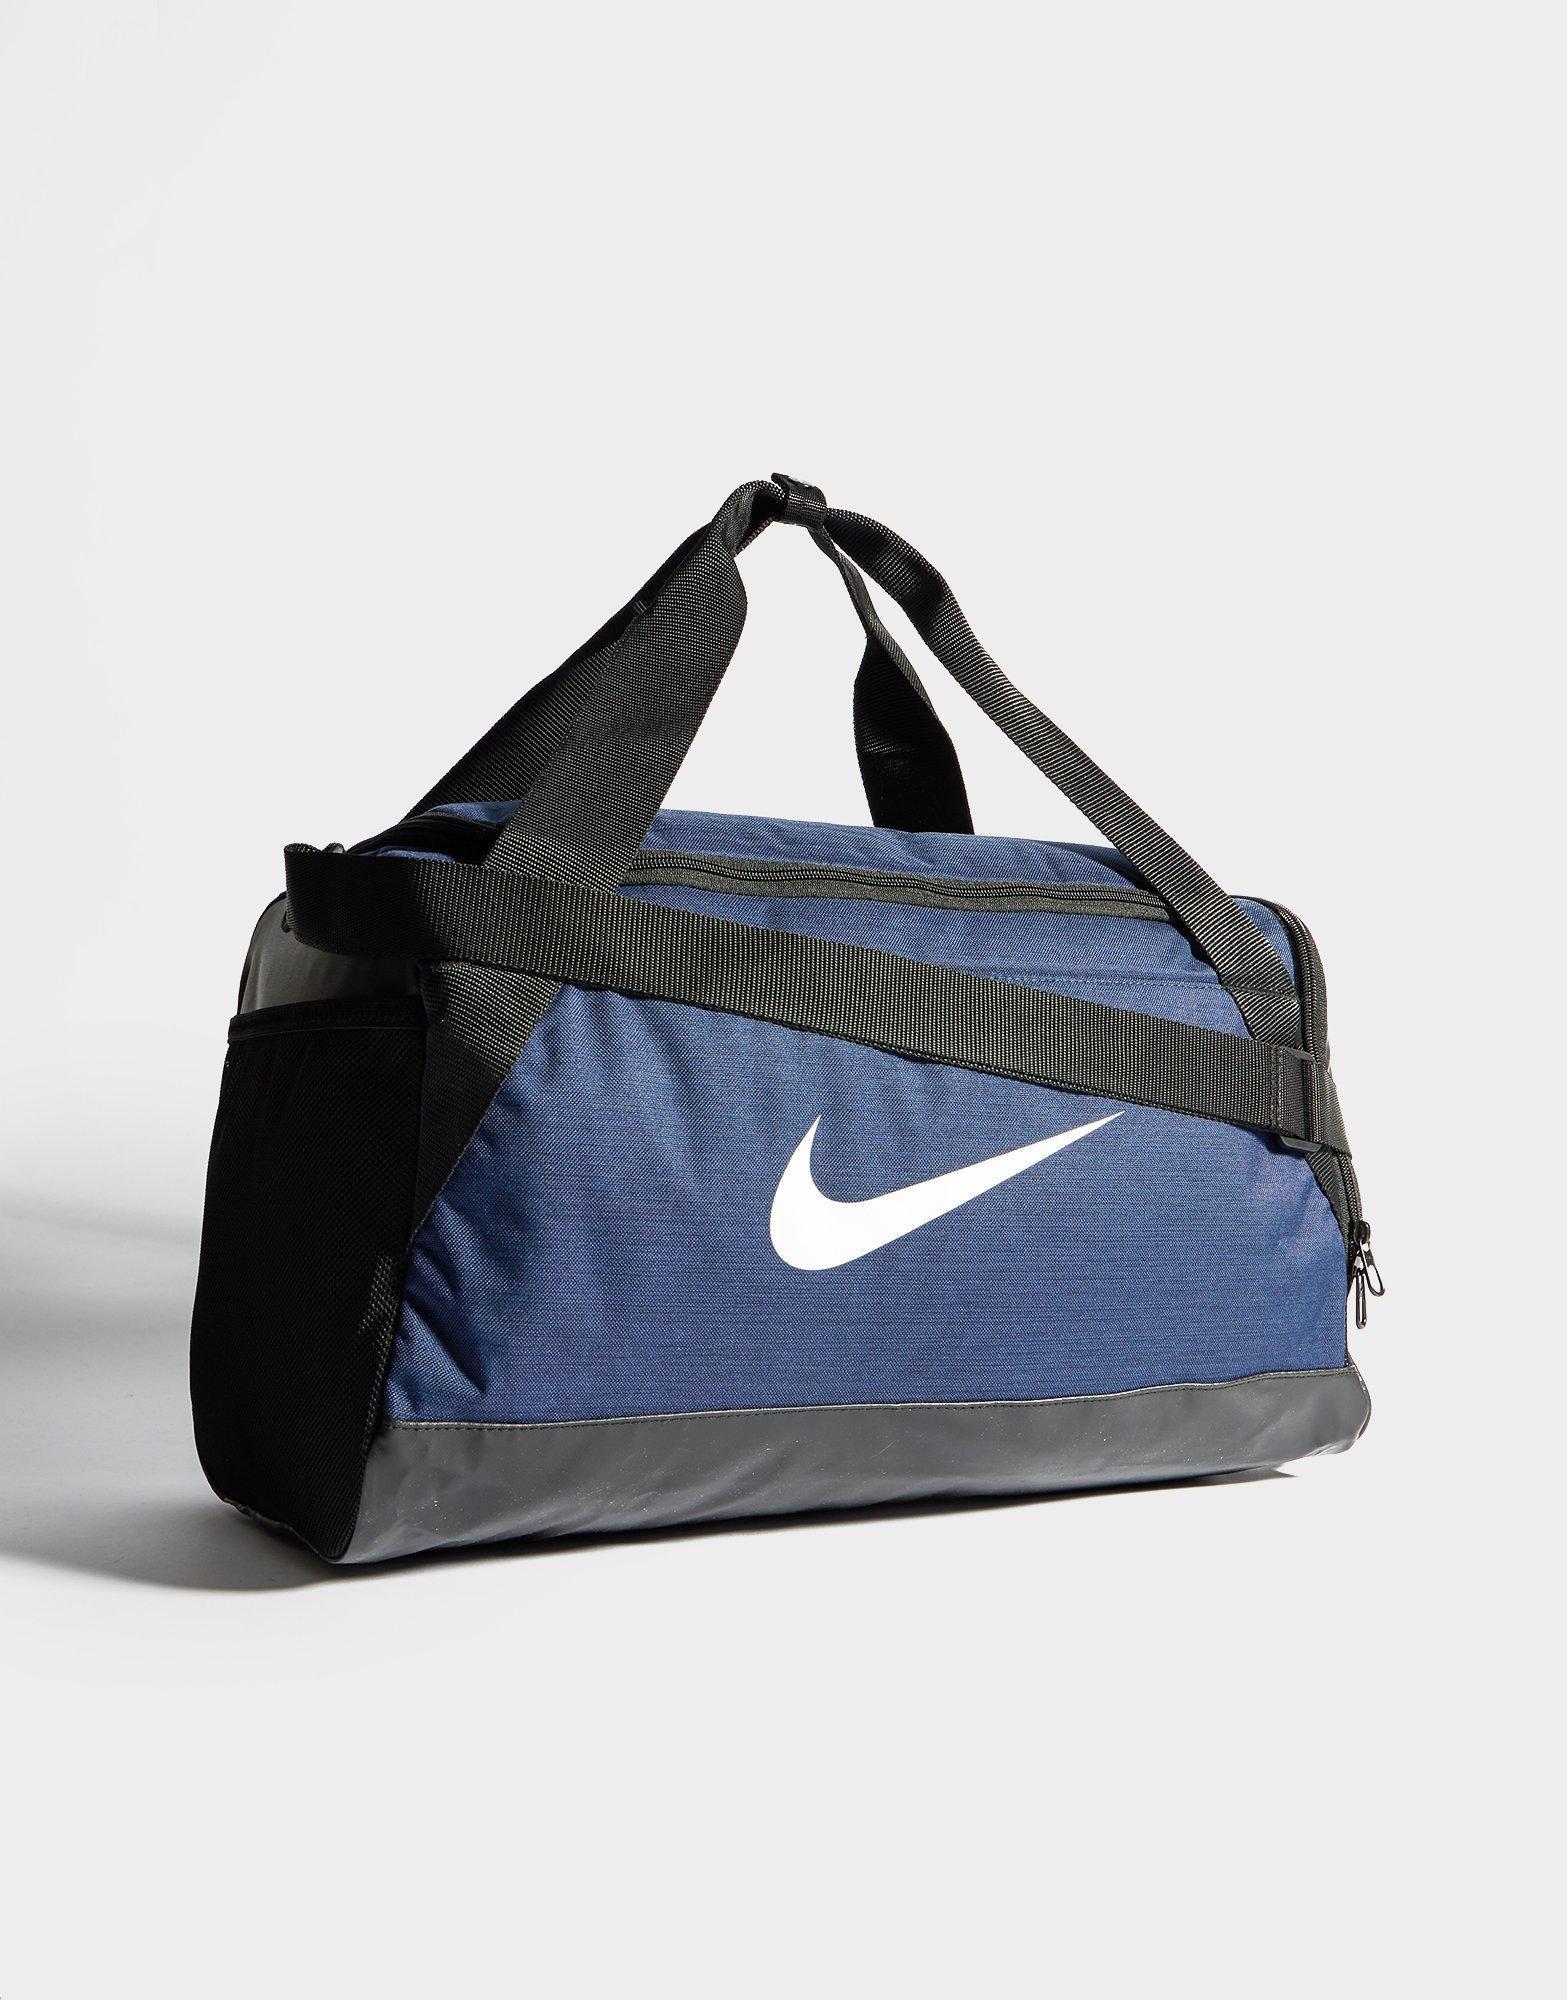 7c9c1887f984 Lyst - Nike Brasilia Small Duffle Bag in Black for Men